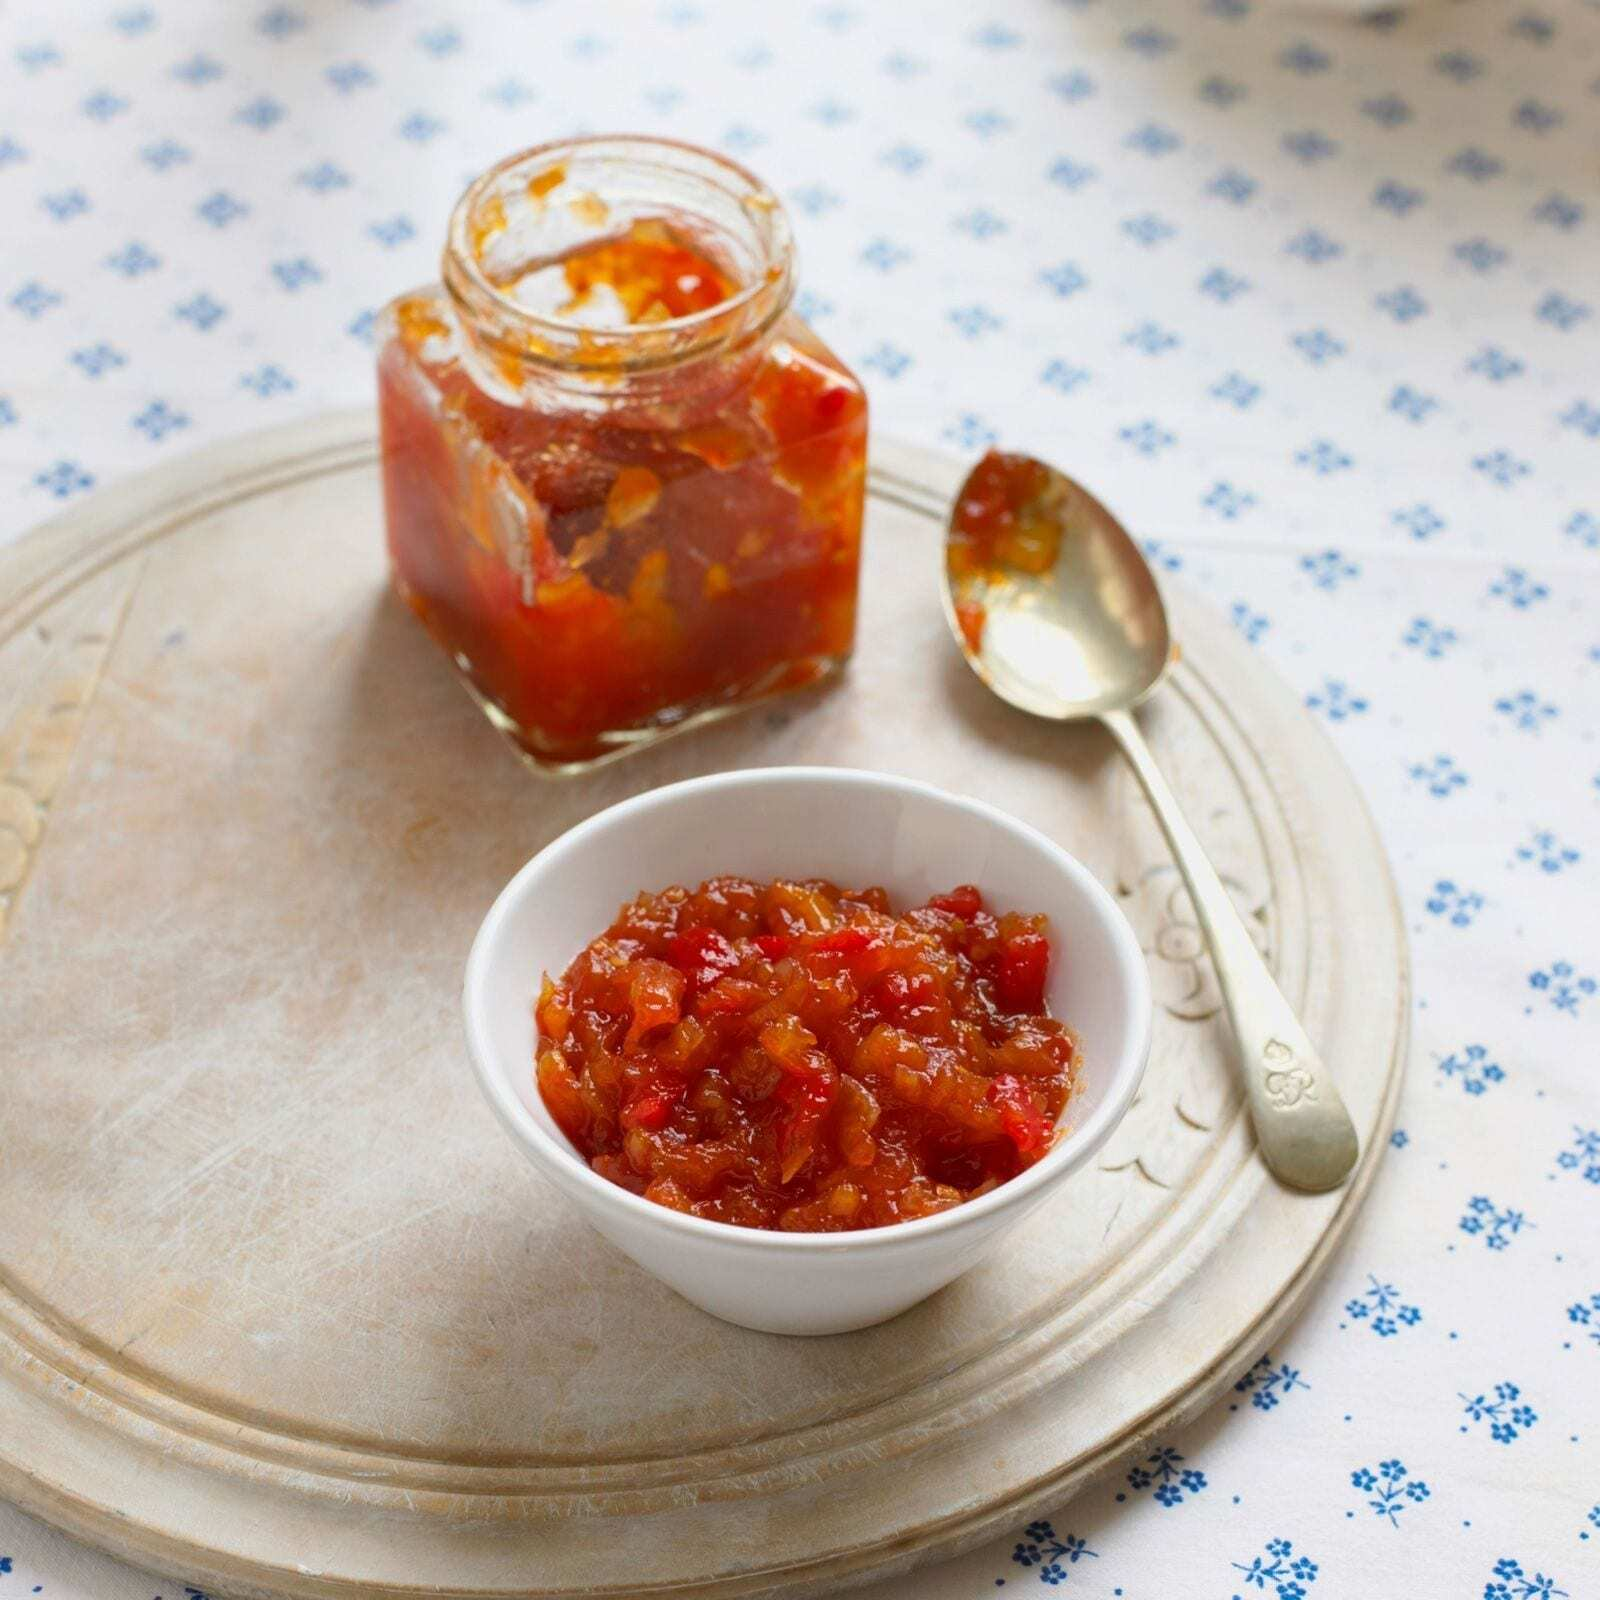 Kürbis Tomaten Chutney von Rosinenkind